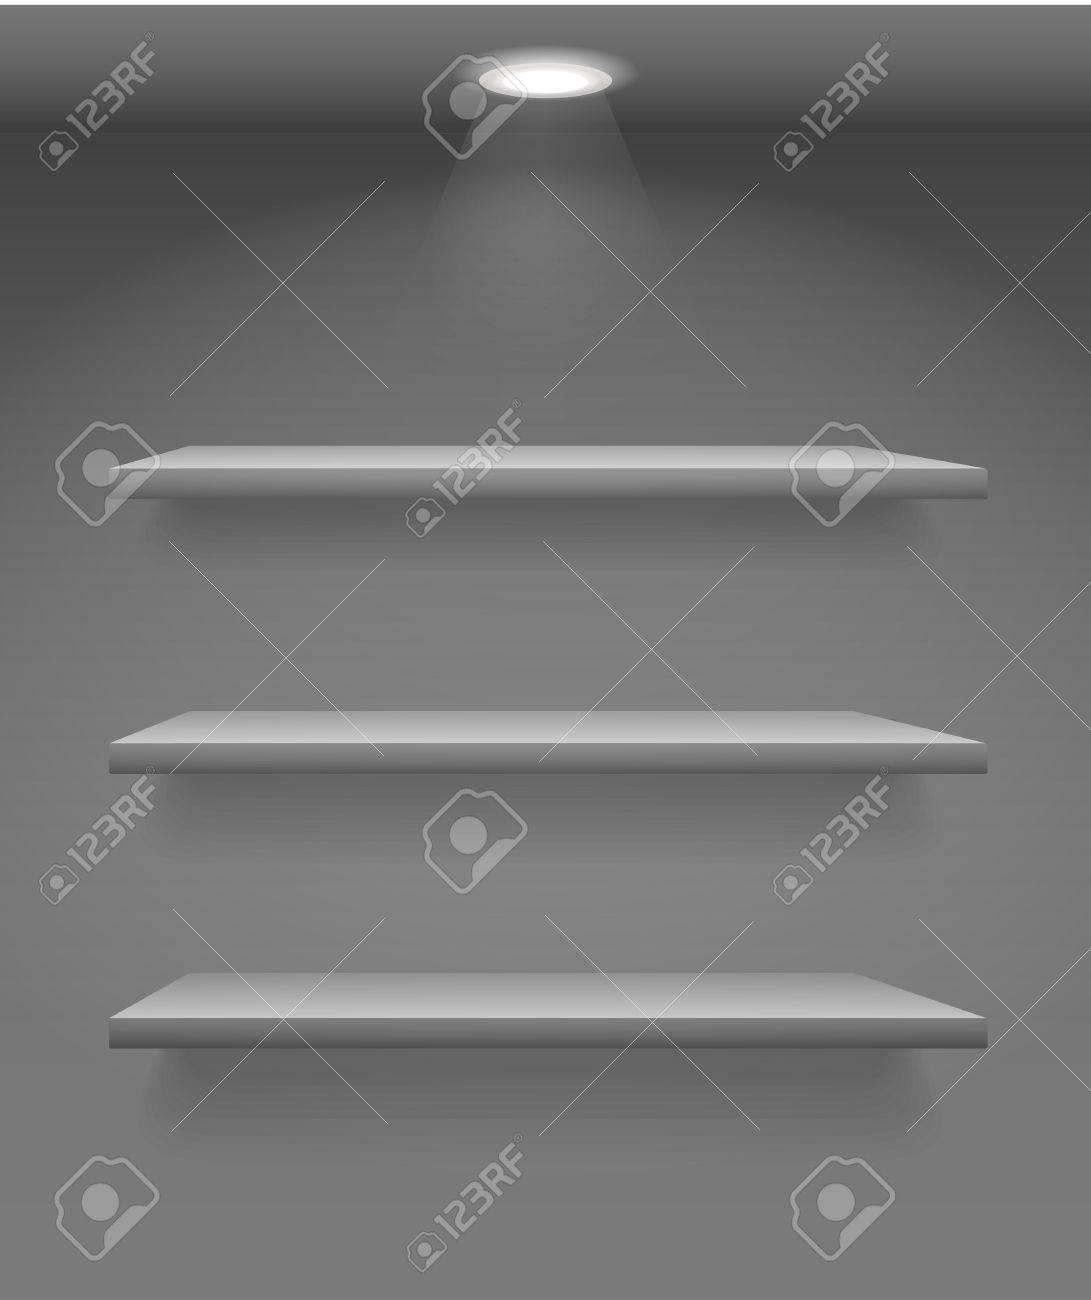 Book shelves on dark wall Stock Vector - 11430587